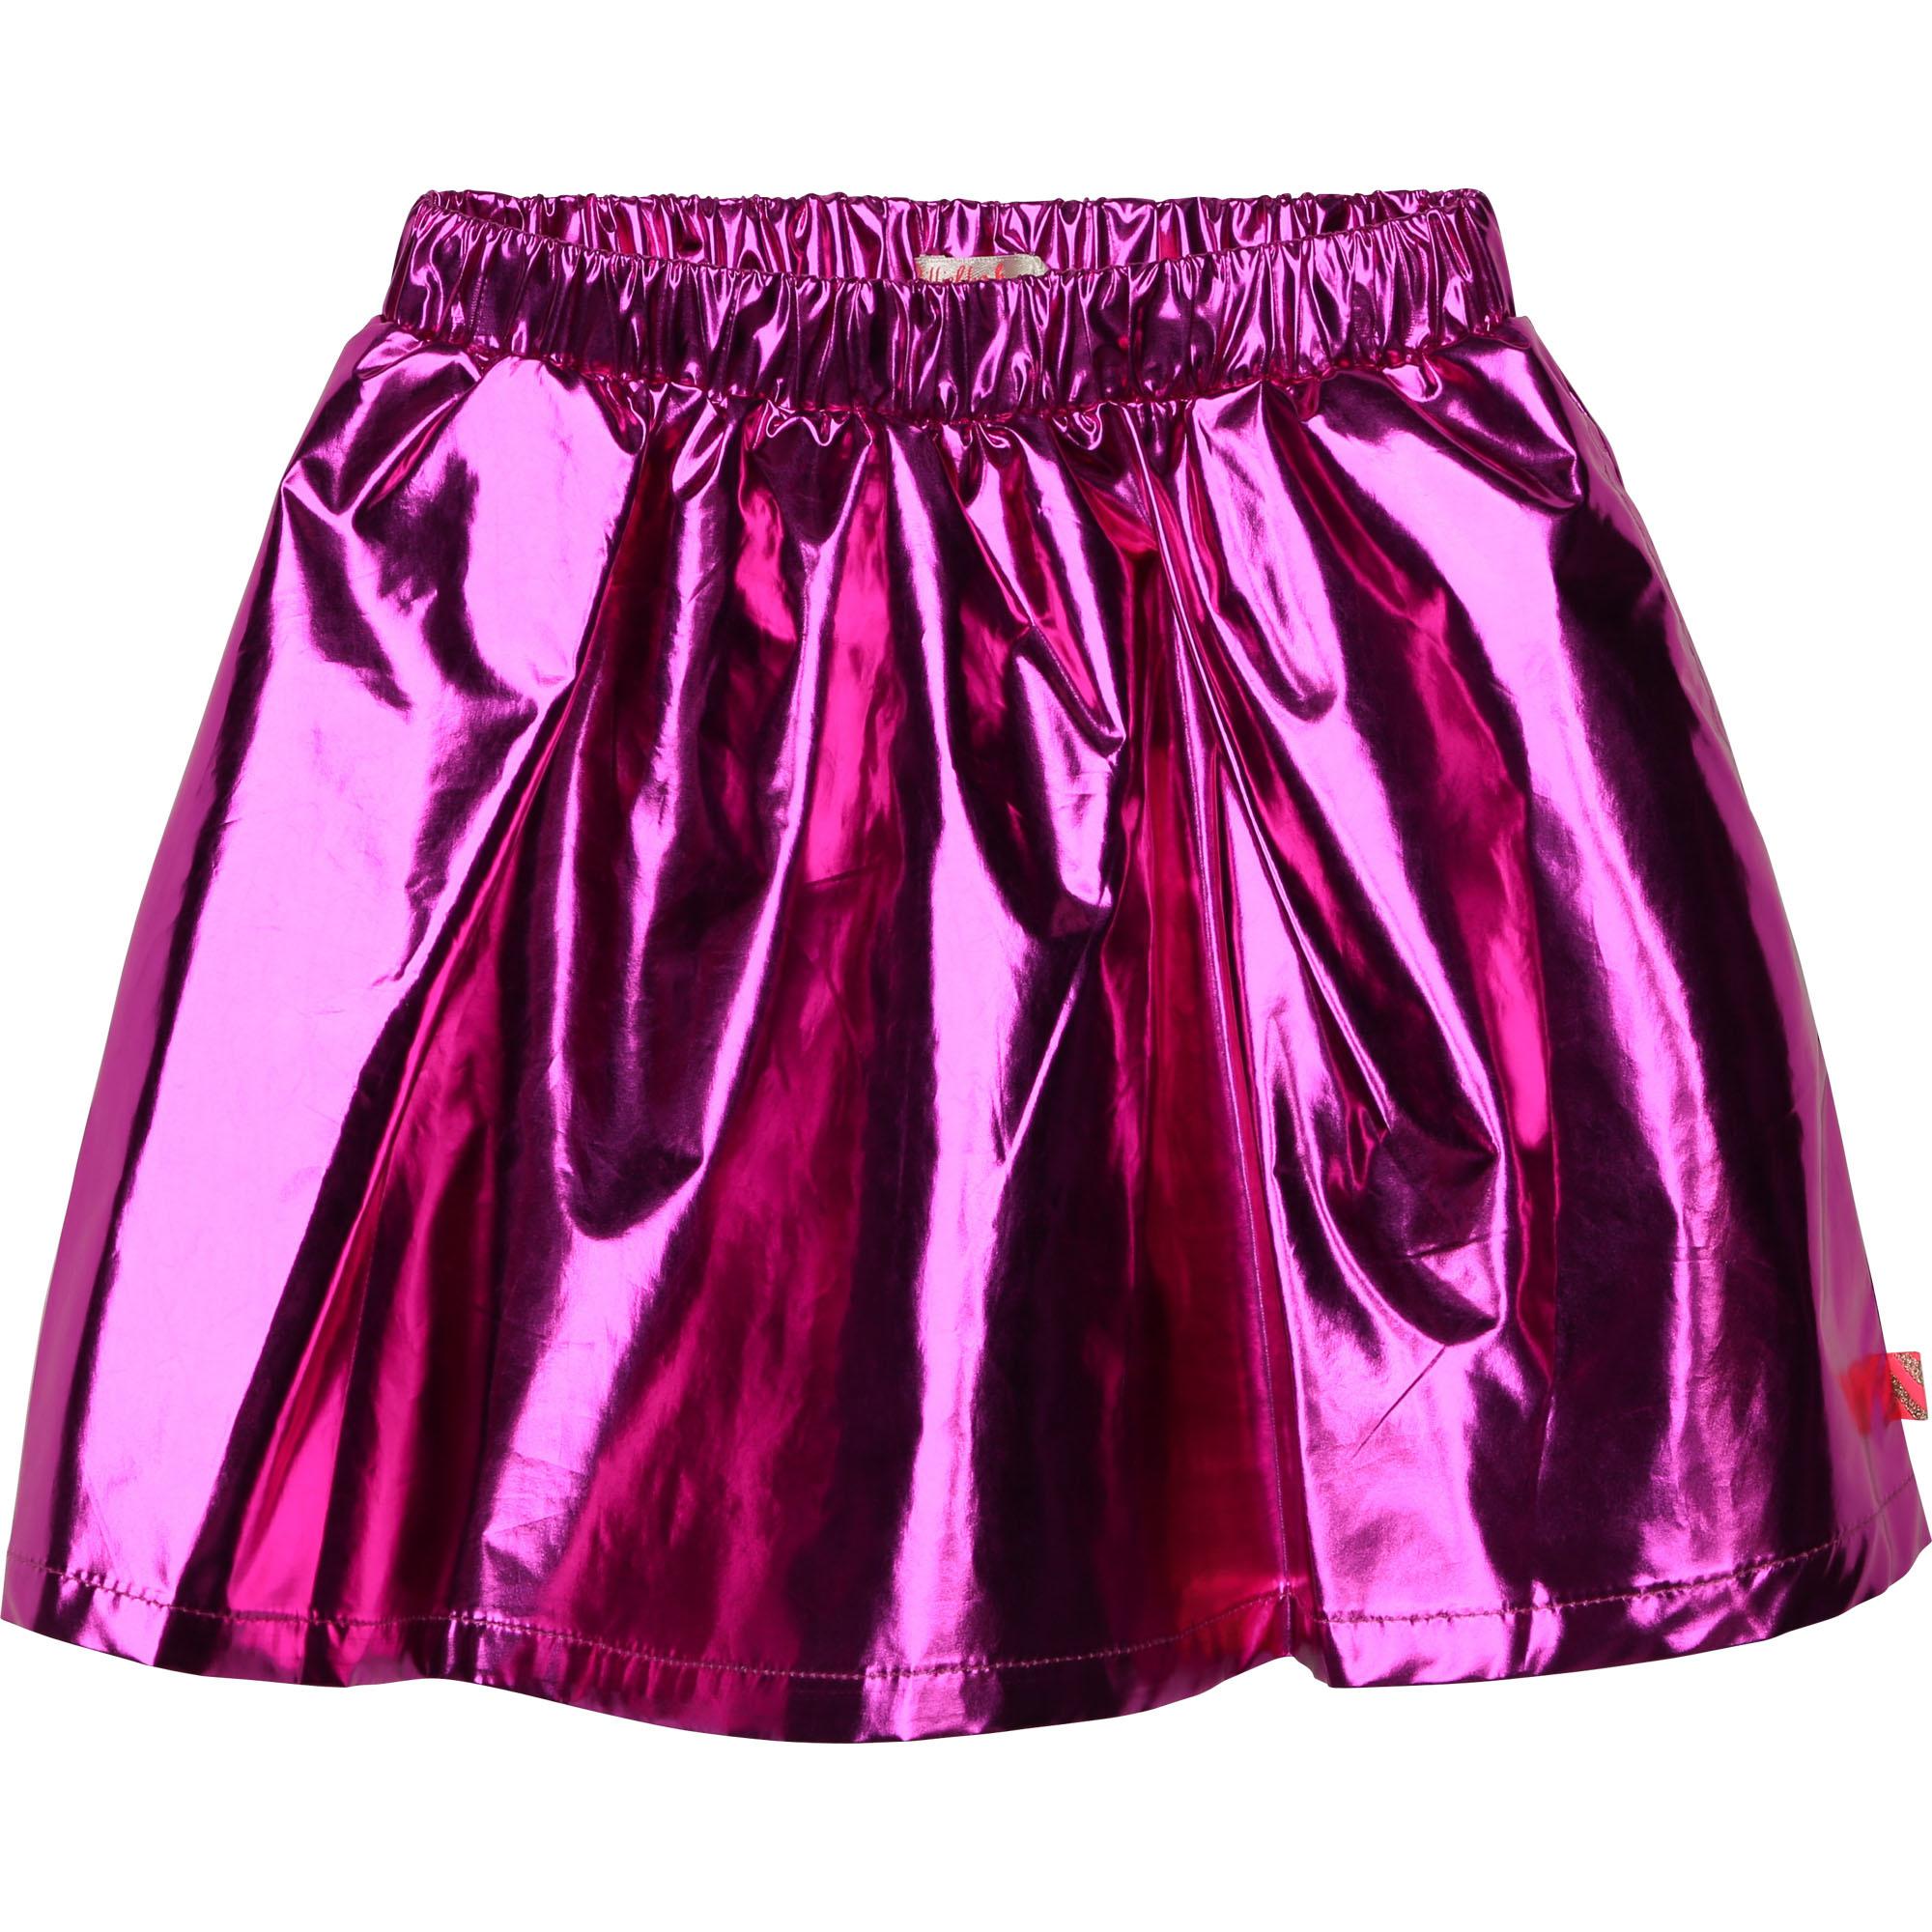 BILLIEBLUSH jupe courte métallisée-1